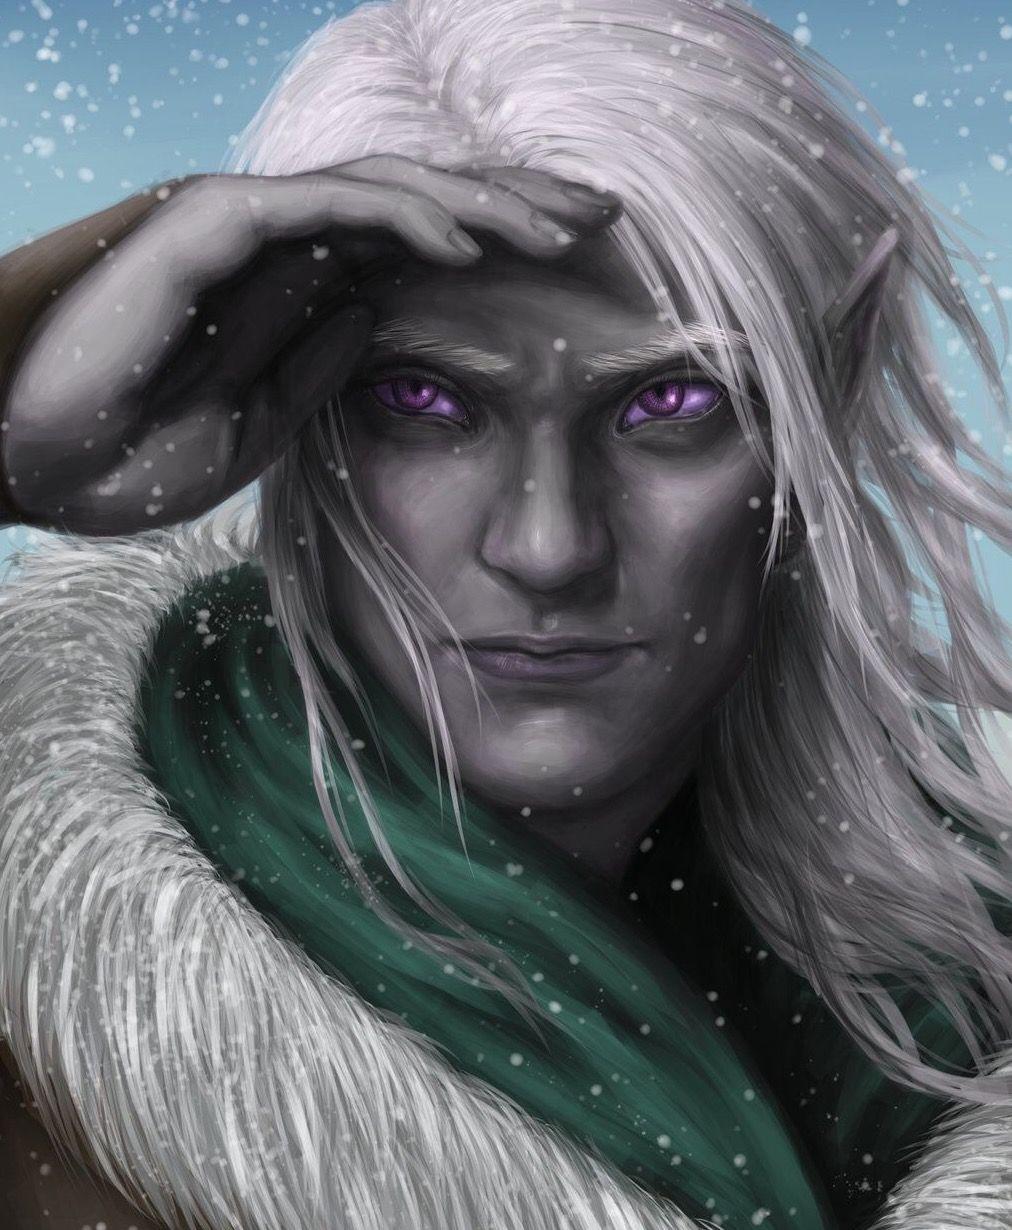 Pin by Jesus Gomez on Legend of drizzt in 2019 | Dark elf ...